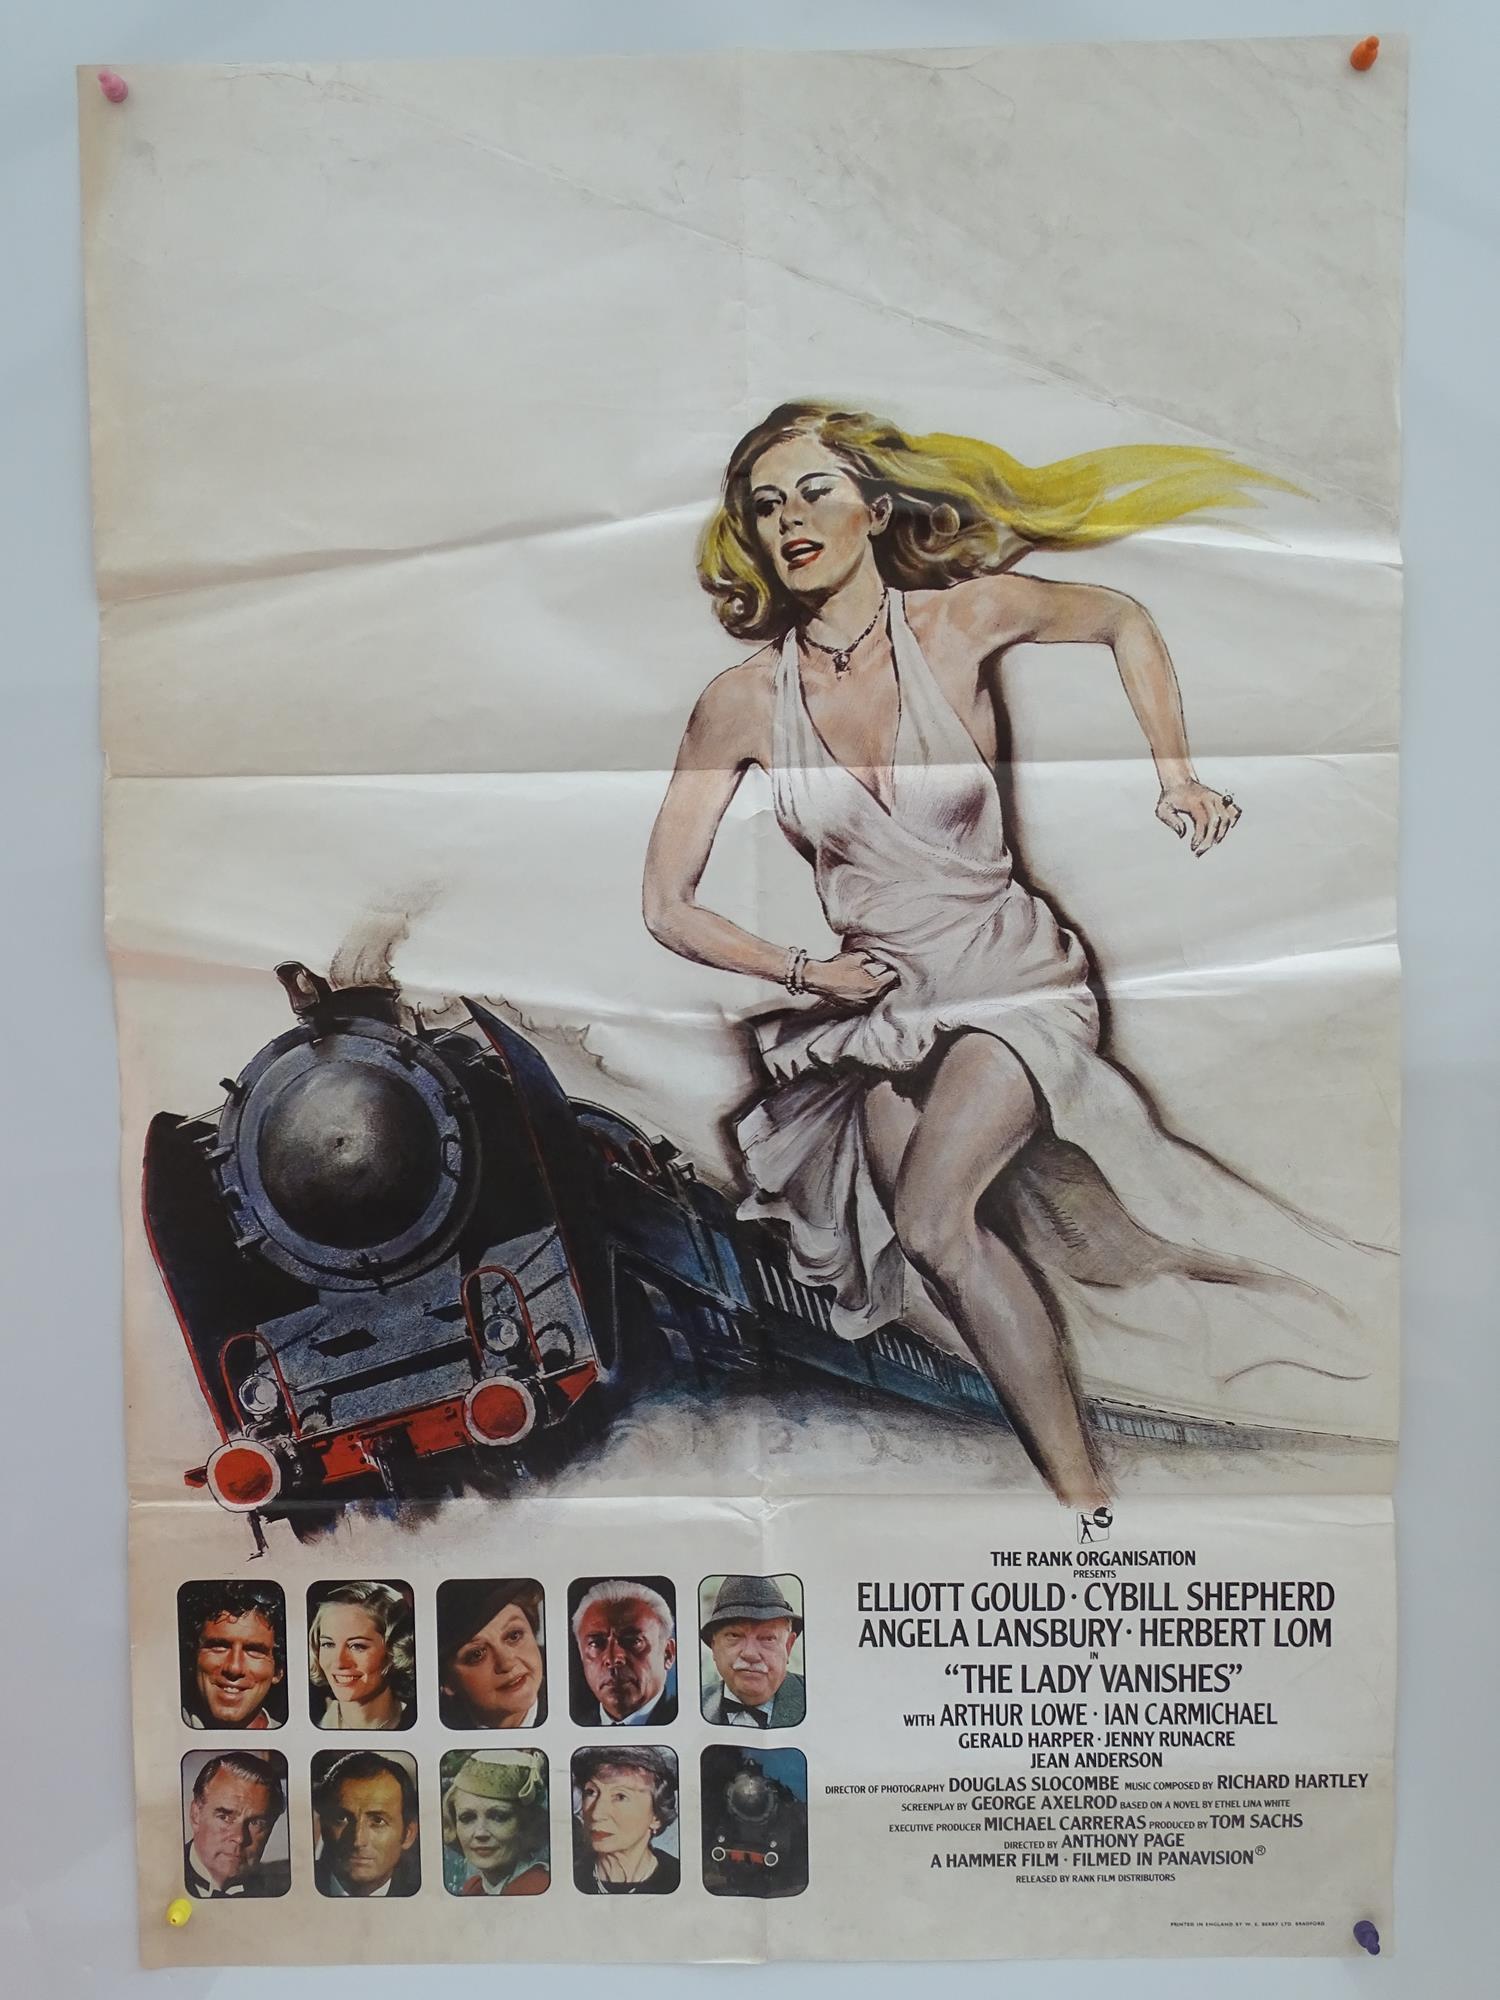 THE LADY VANISHES (1979) - British One Sheet Movie Poster - Elliott Gould, Sybil Shepherd, Angela